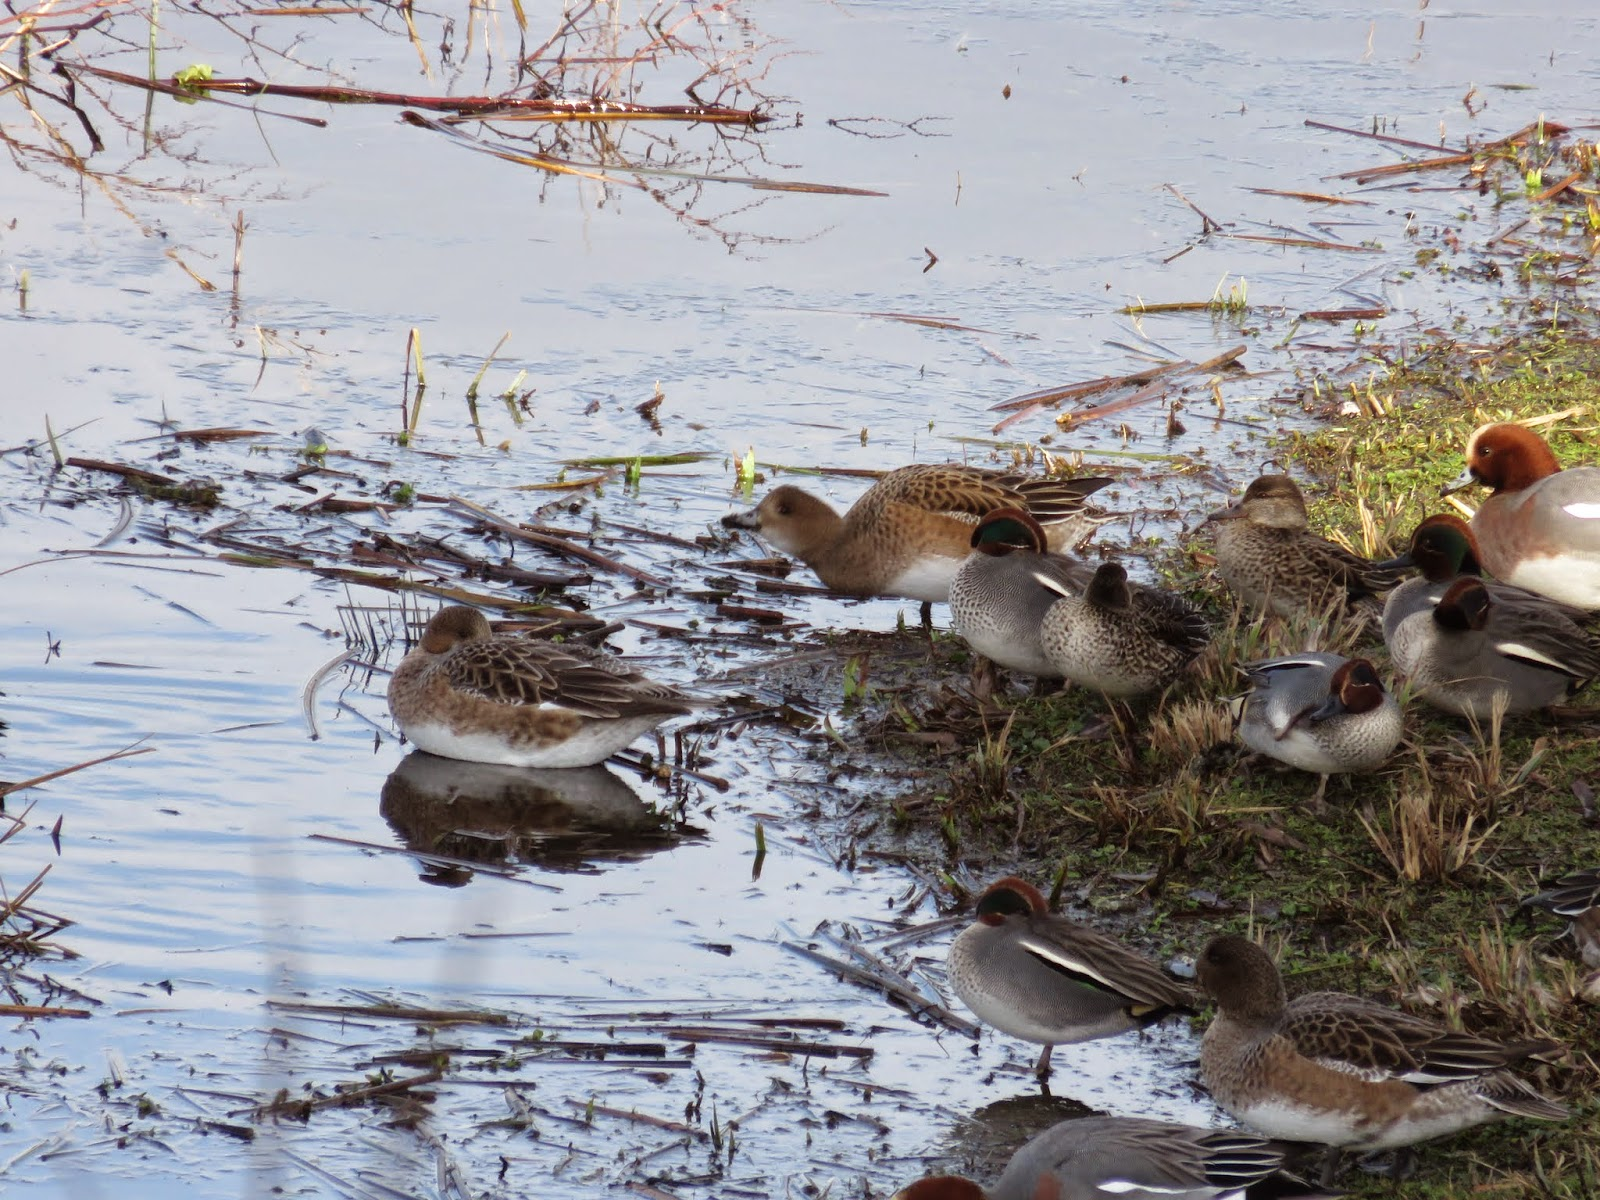 Ducks - Wigeons